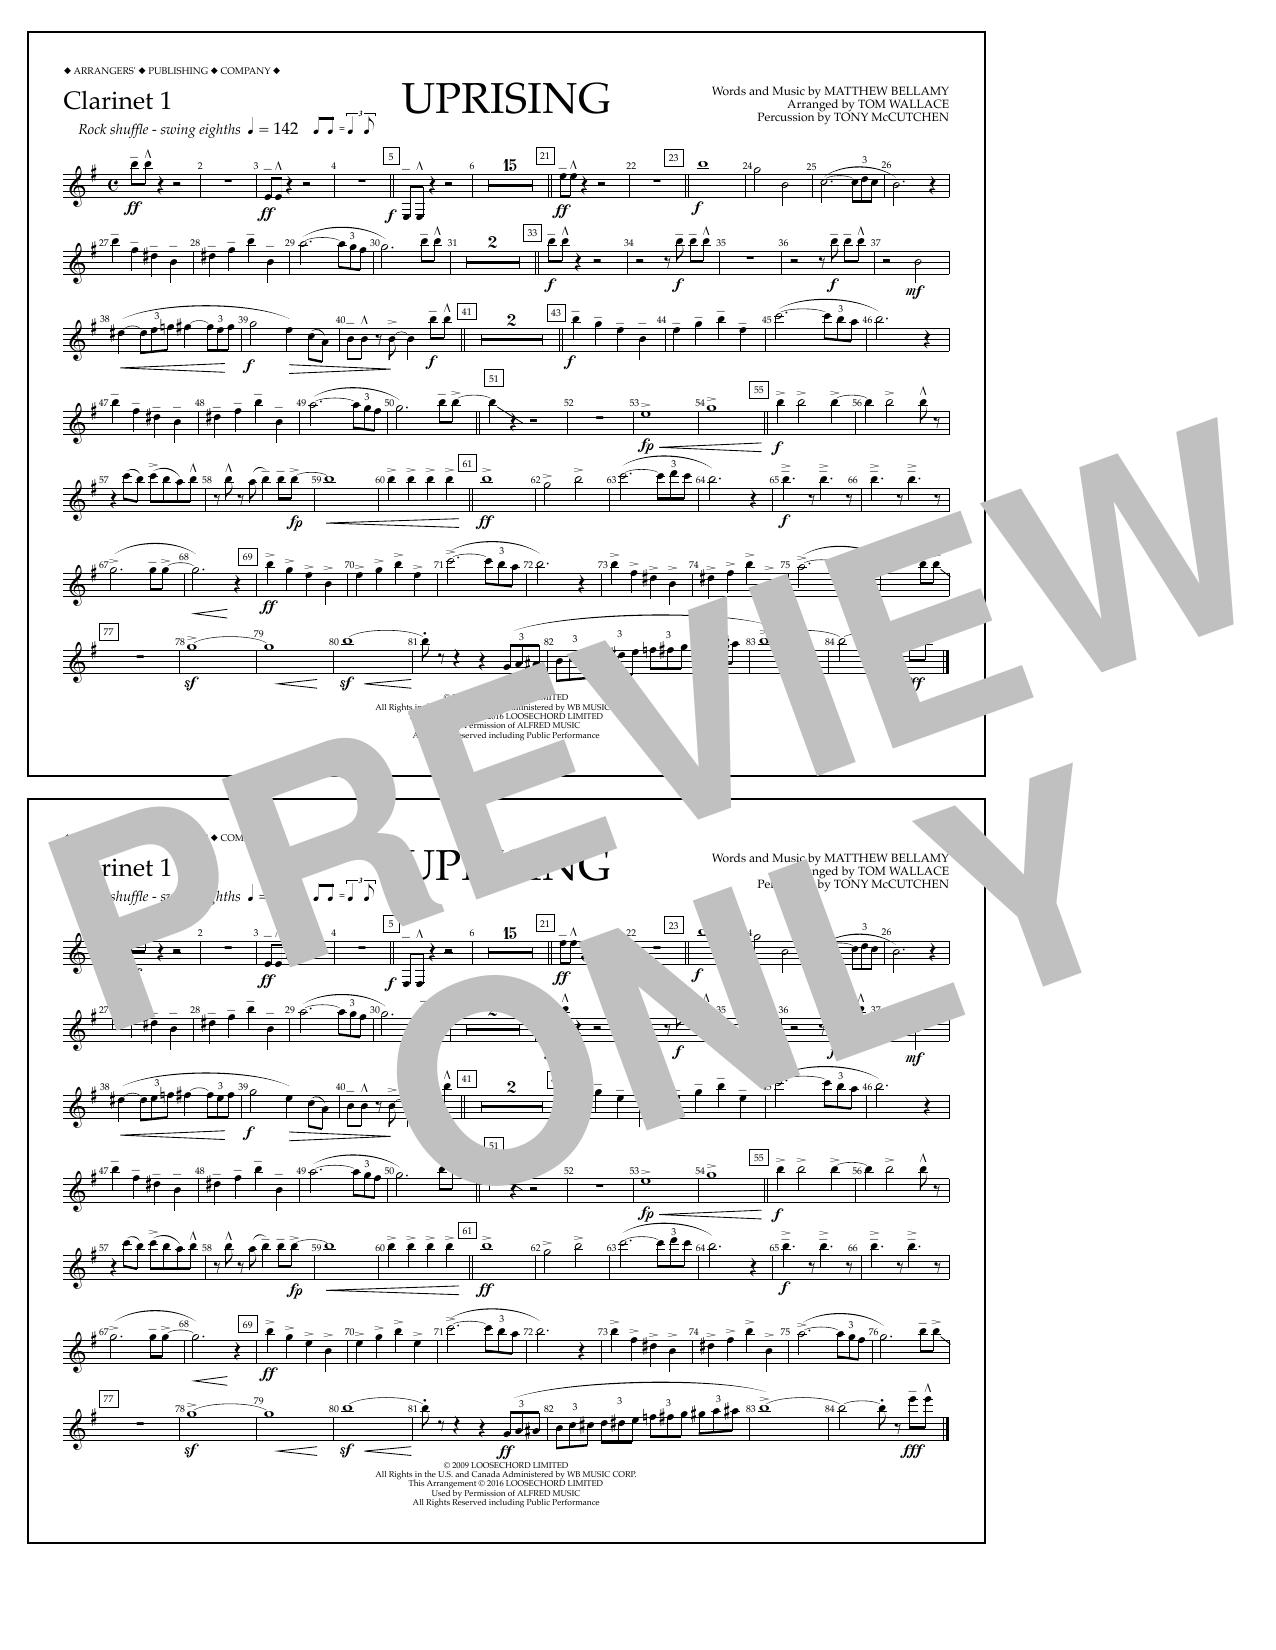 Muse - Uprising - Clarinet 1